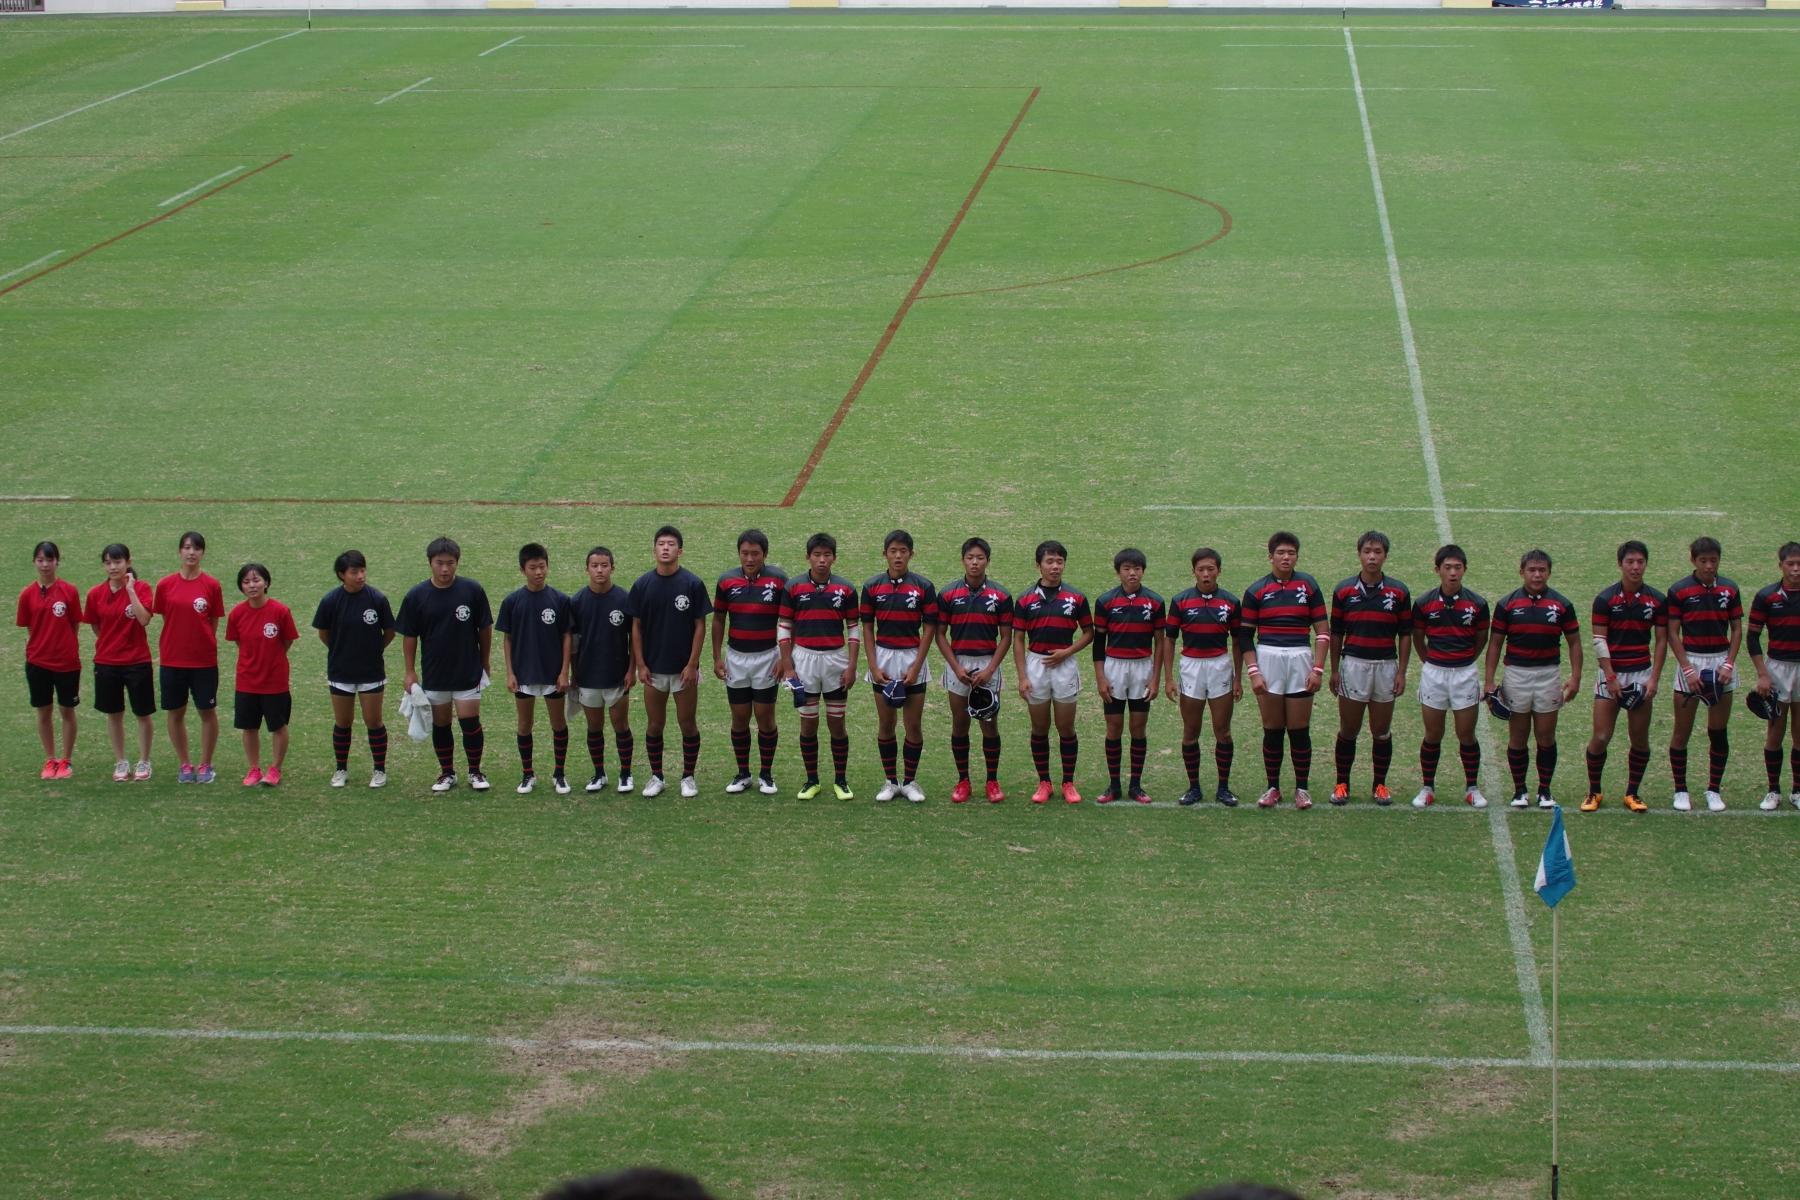 http://kokura-rugby.sakura.ne.jp/180917_125504_1521.jpg